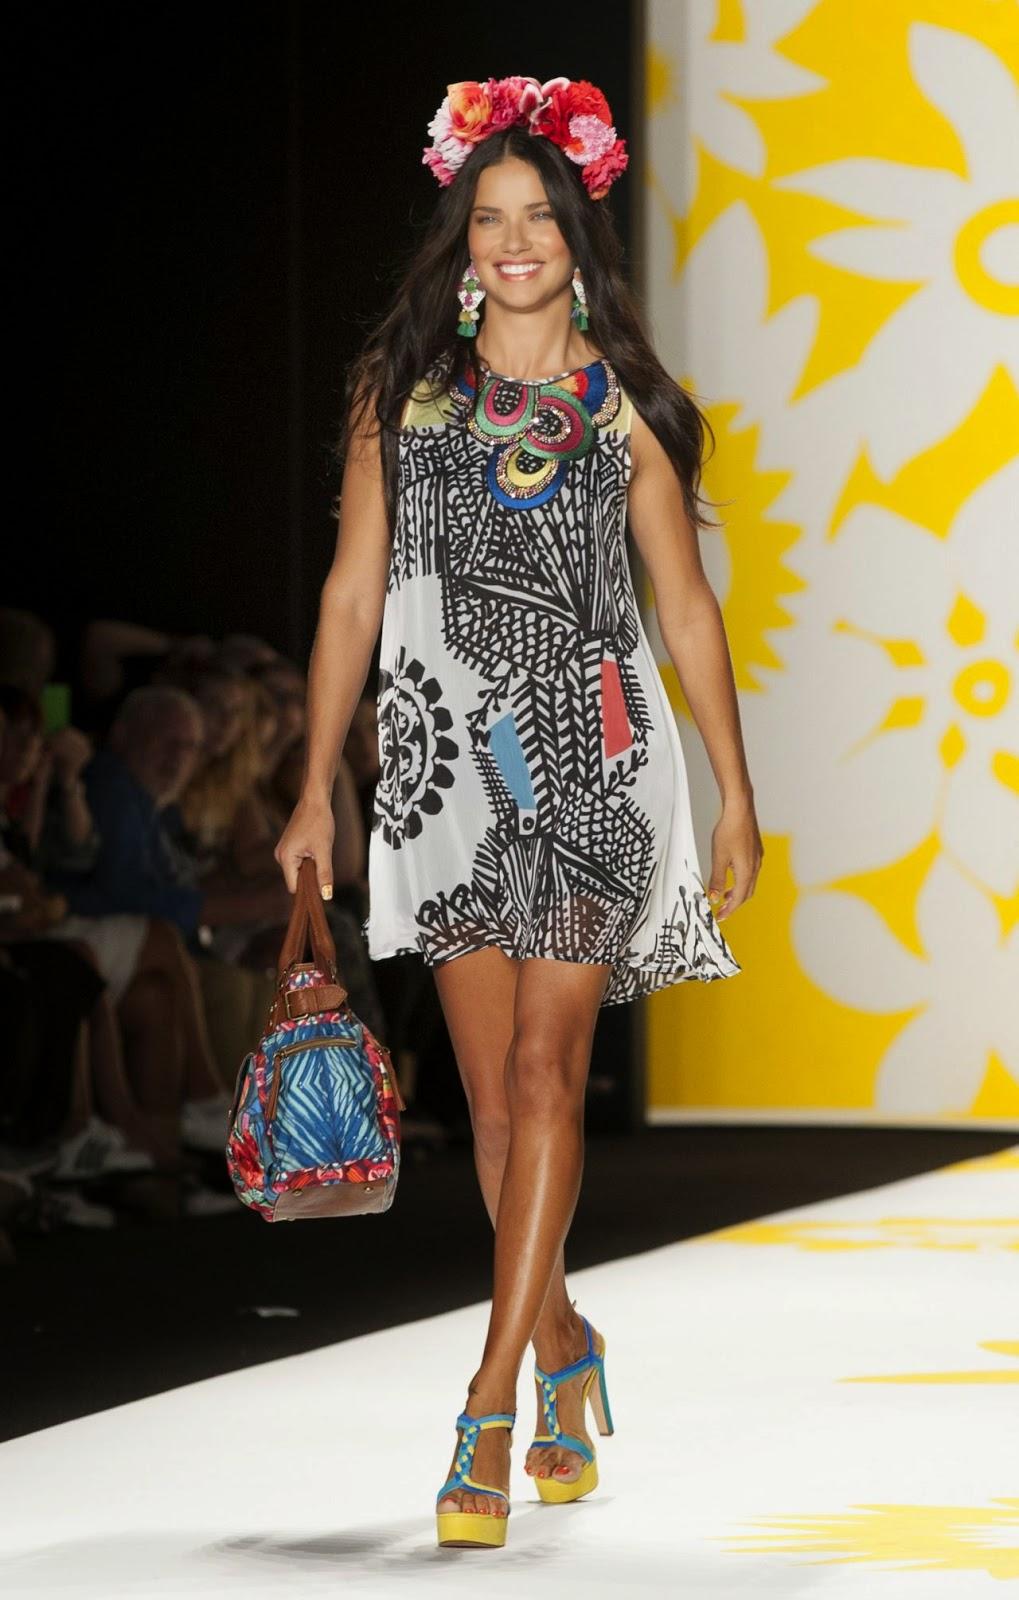 Adriana Lima walks the Desigual Spring 2015 runway at the New York Fashion Week